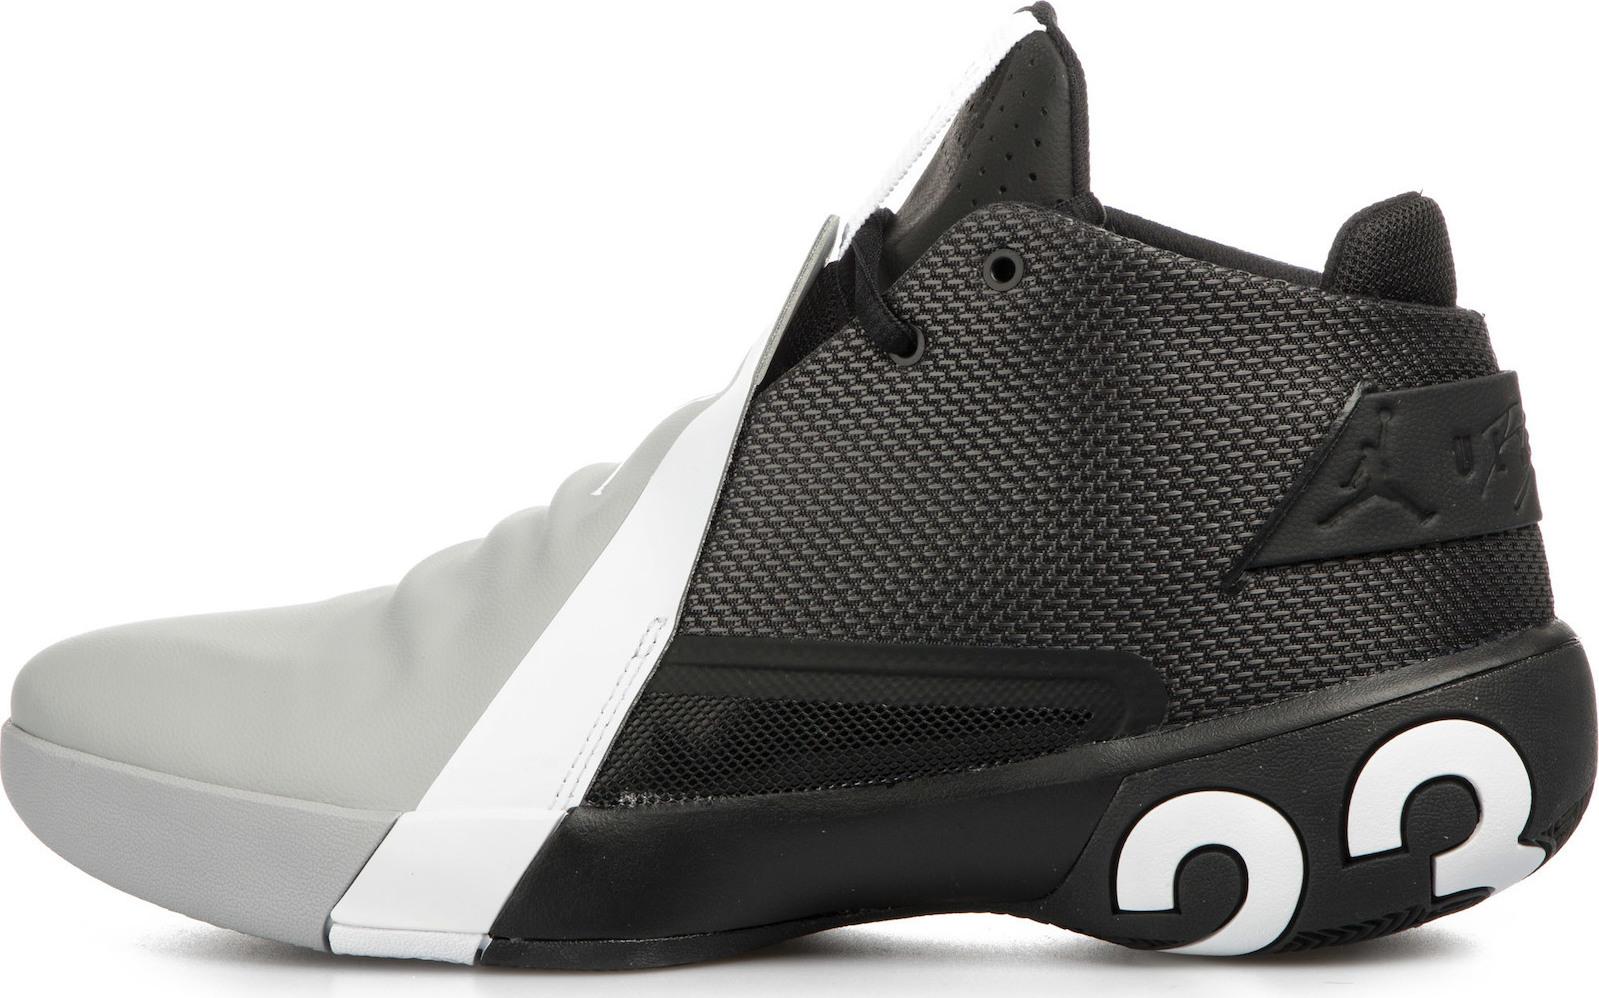 6a19ec3d767d Προσθήκη στα αγαπημένα menu Nike Jordan Ultra.Fly 3